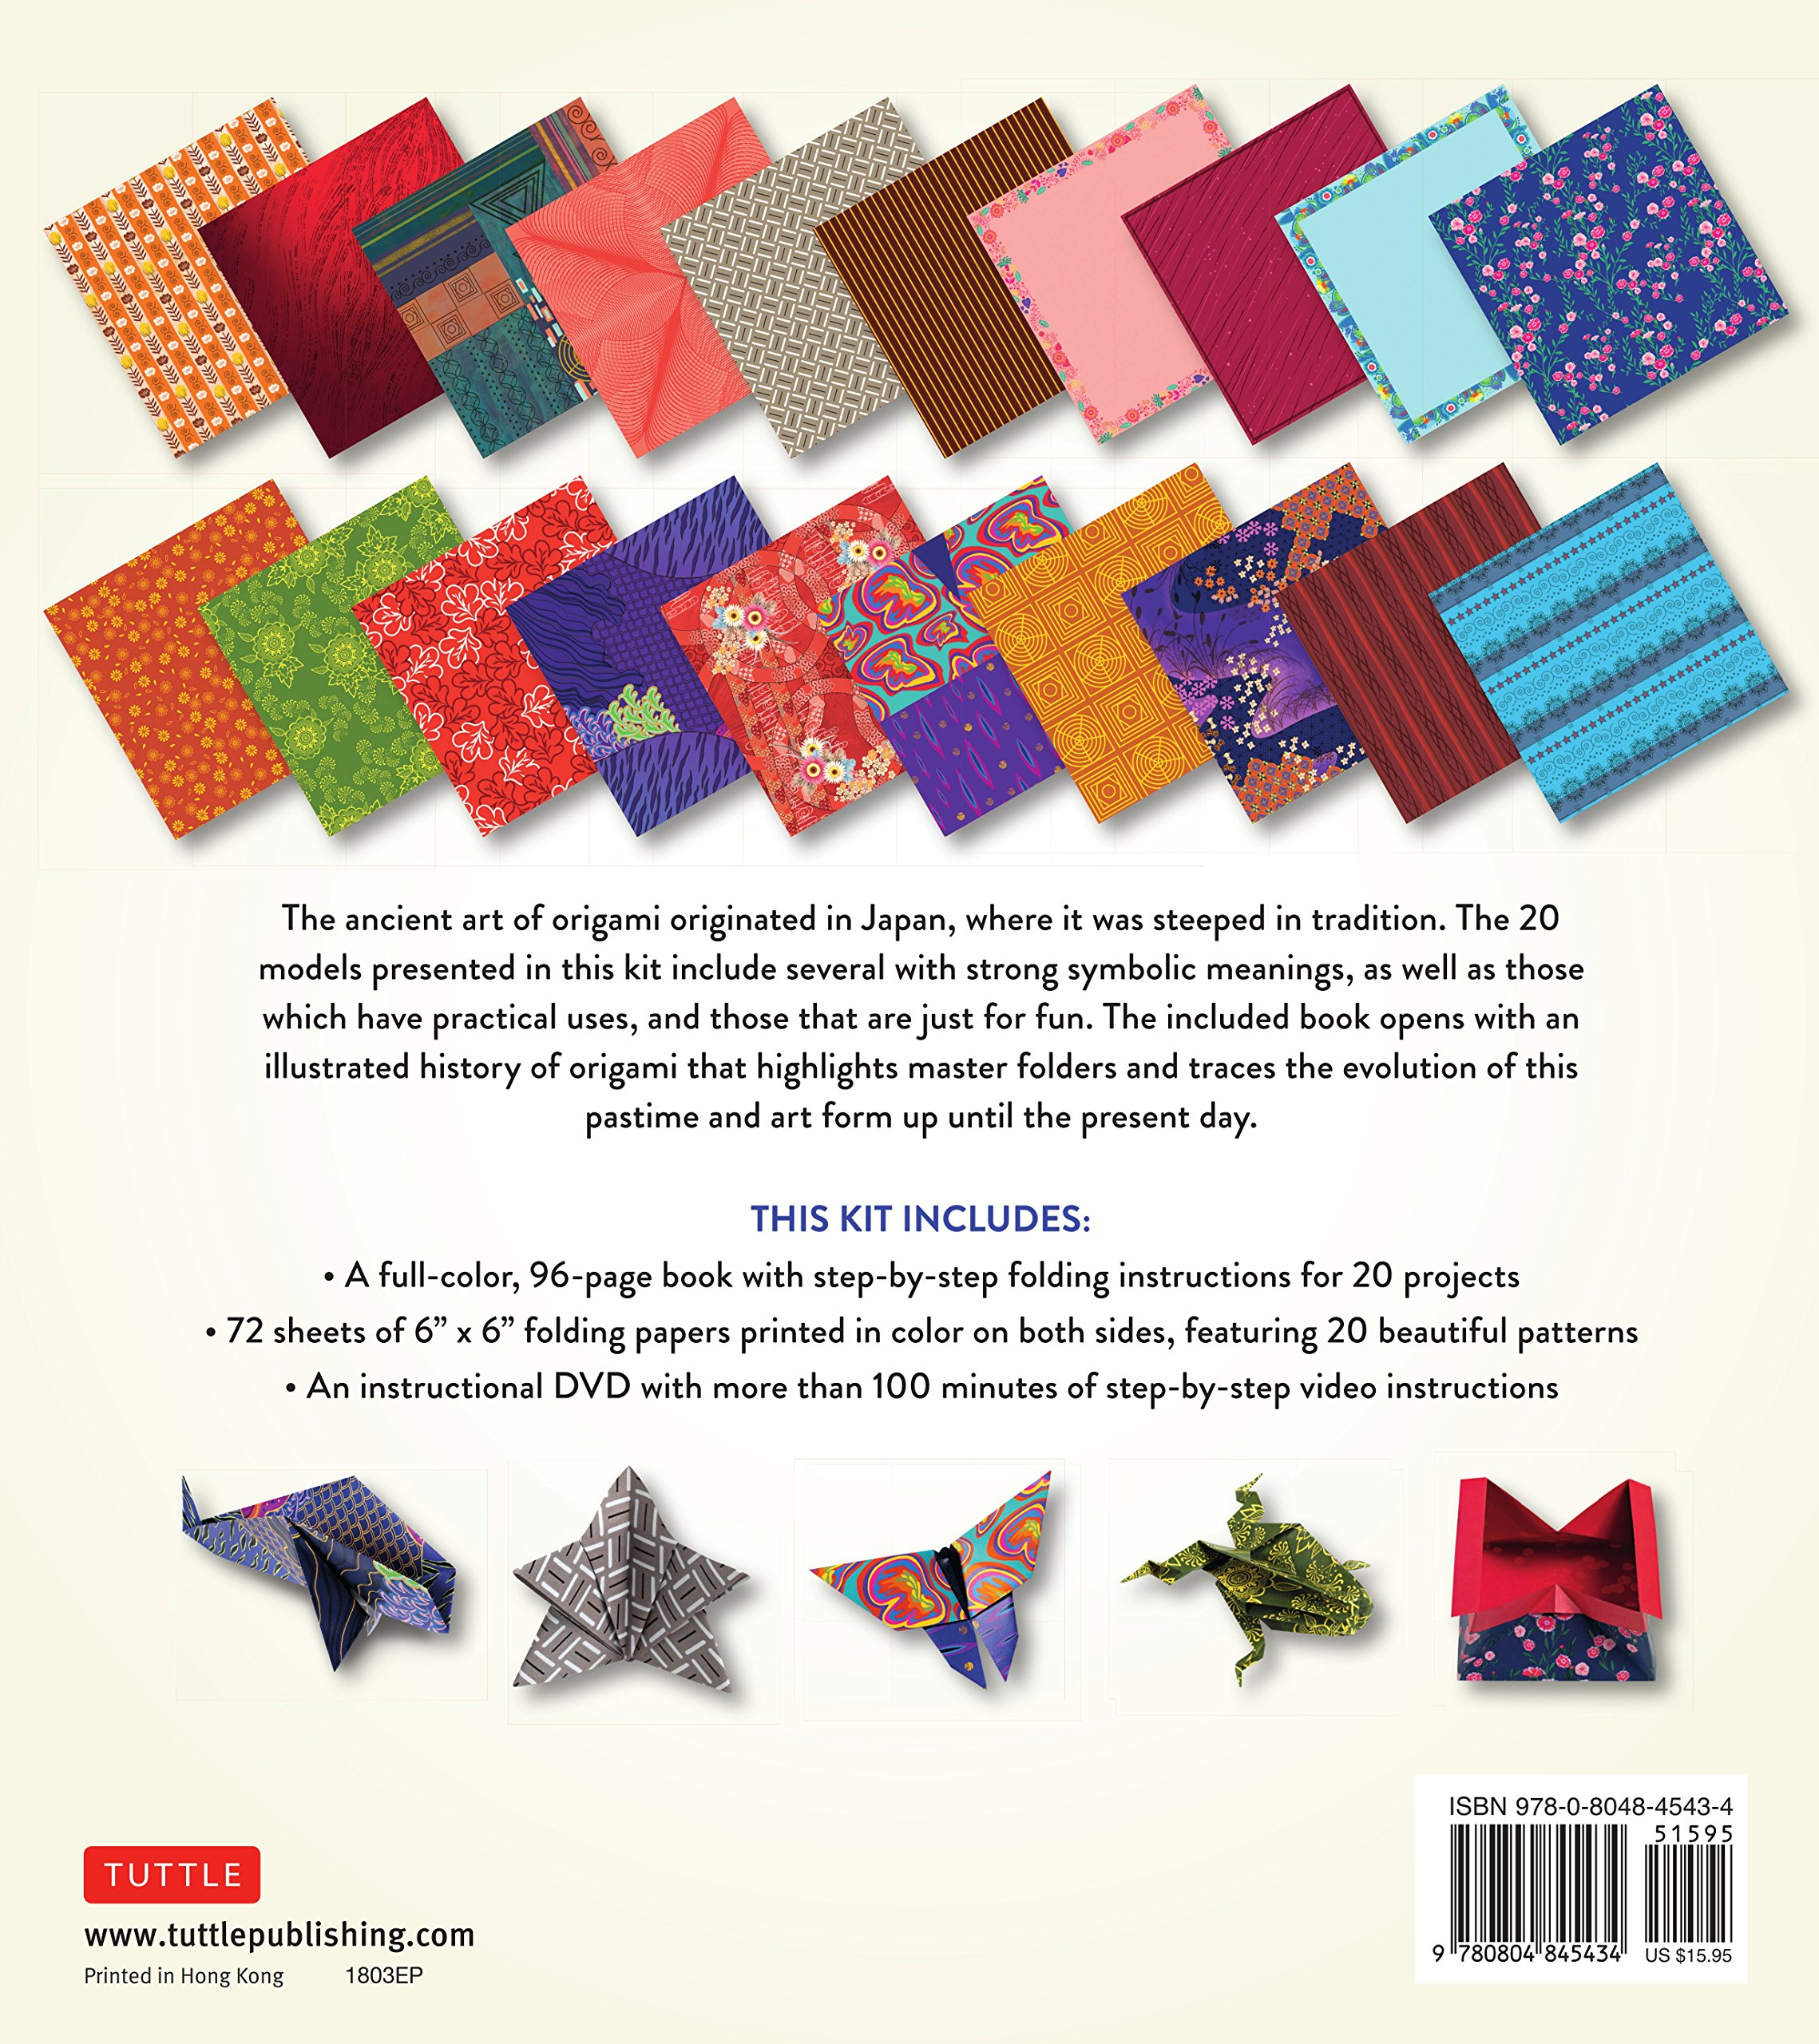 Japanese origami for beginners amazon vanda battaglia japanese origami for beginners amazon vanda battaglia francesco decio 0814050013282 books jeuxipadfo Image collections